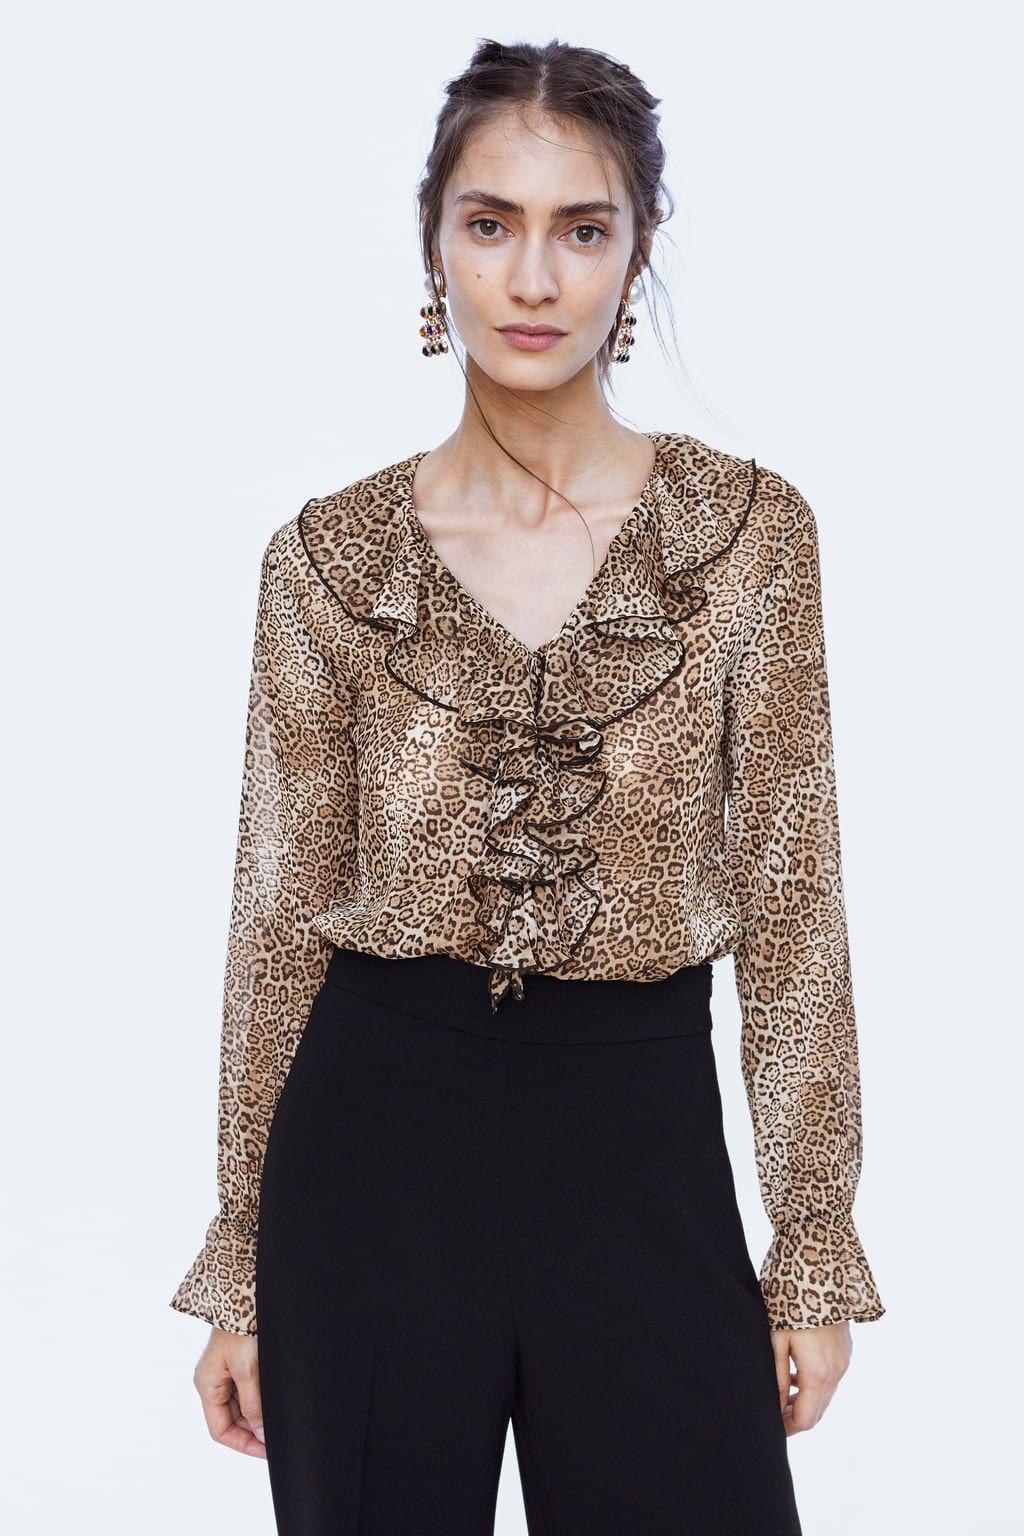 a1a9c9b6bb5b Zara Printed Shirt With Pouch Pocket | Top Mode Depot